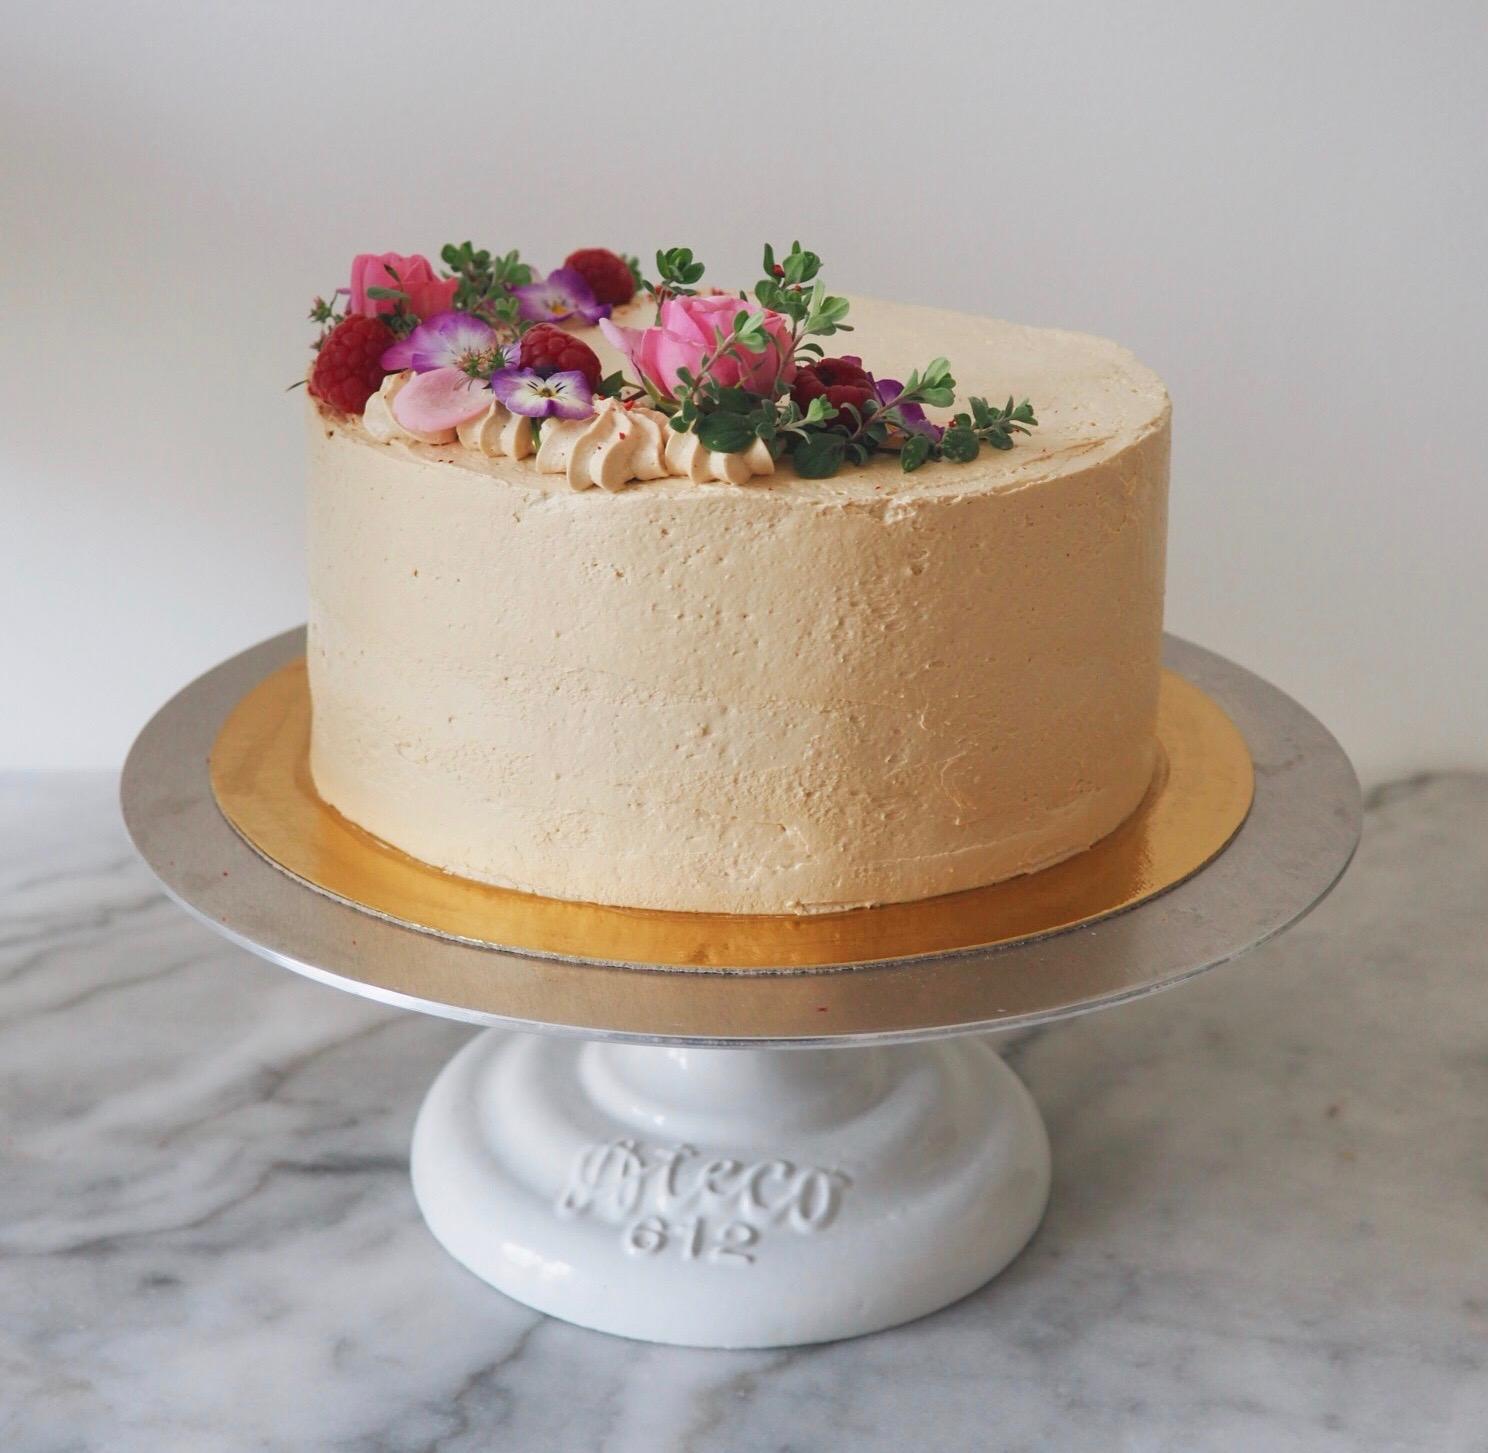 Cardamom & Coffee Cake with fresh Raspberries & Chocolate Ganache